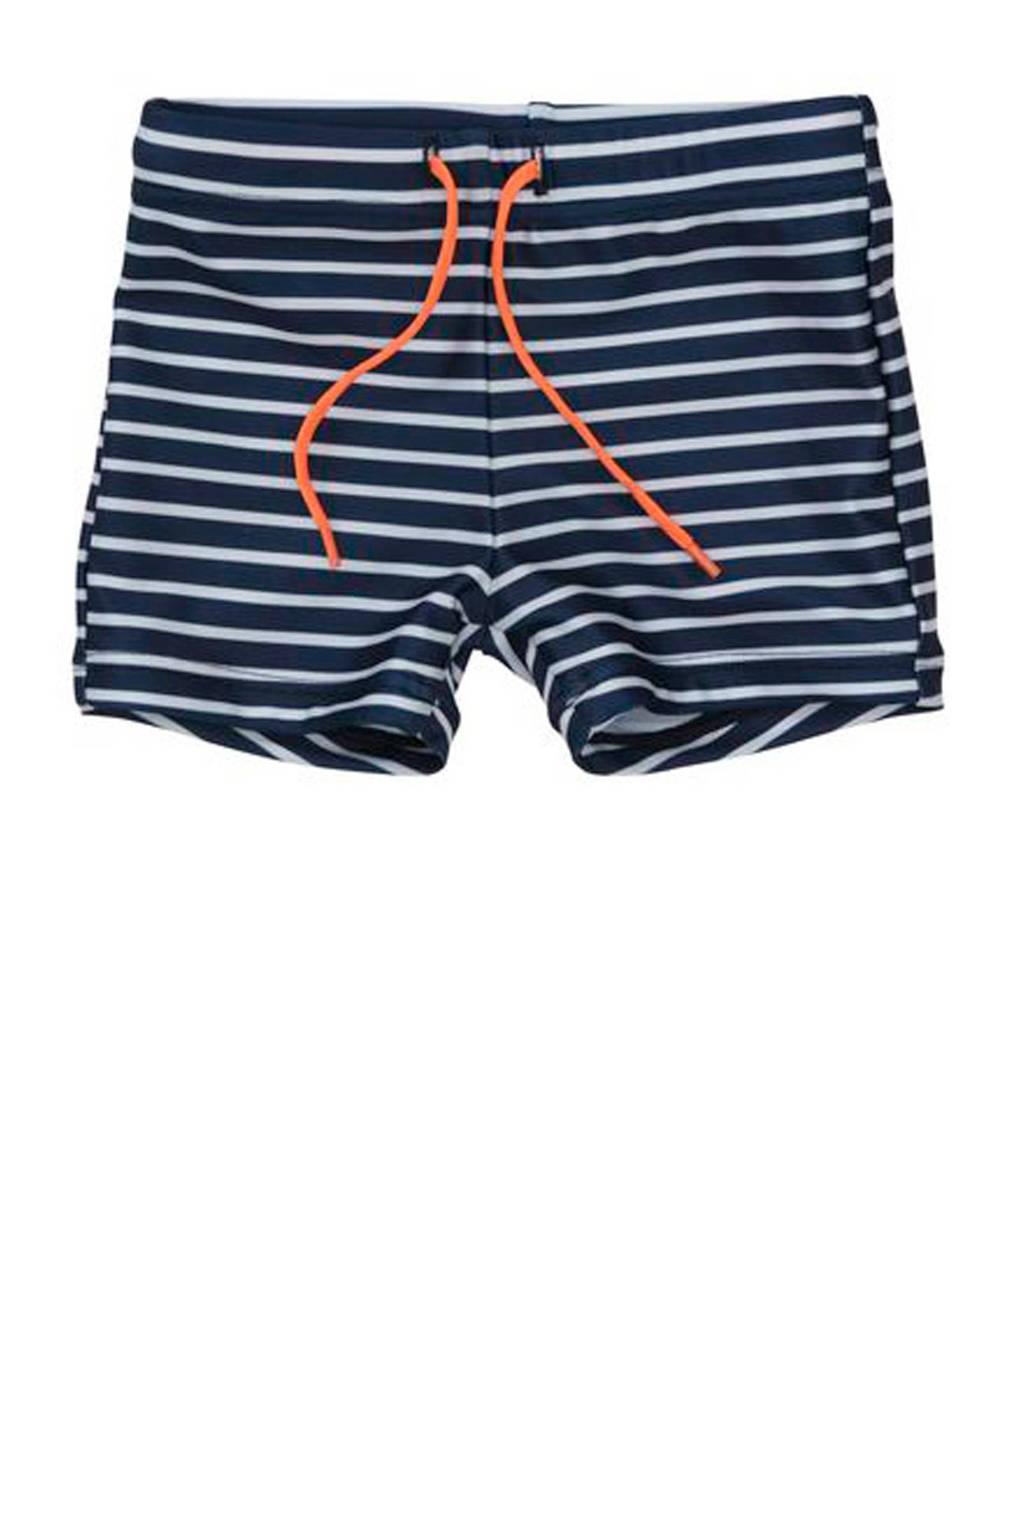 HEMA gestreepte zwemboxer blauw, Donkerblauw/wit